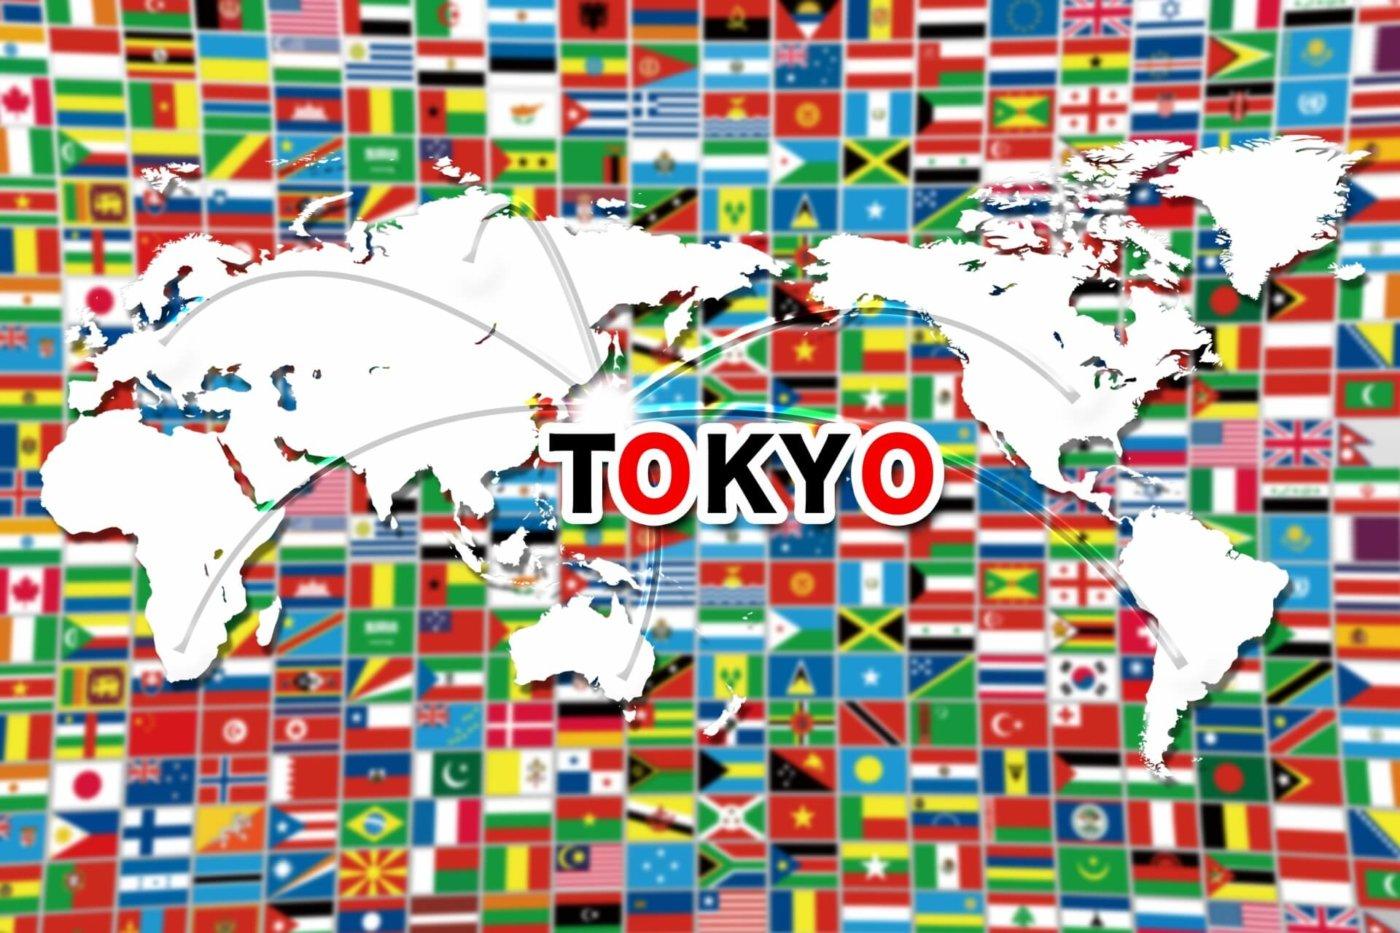 2016FIFAフットサルW杯日本代表!東京オリンピック大会を目指し